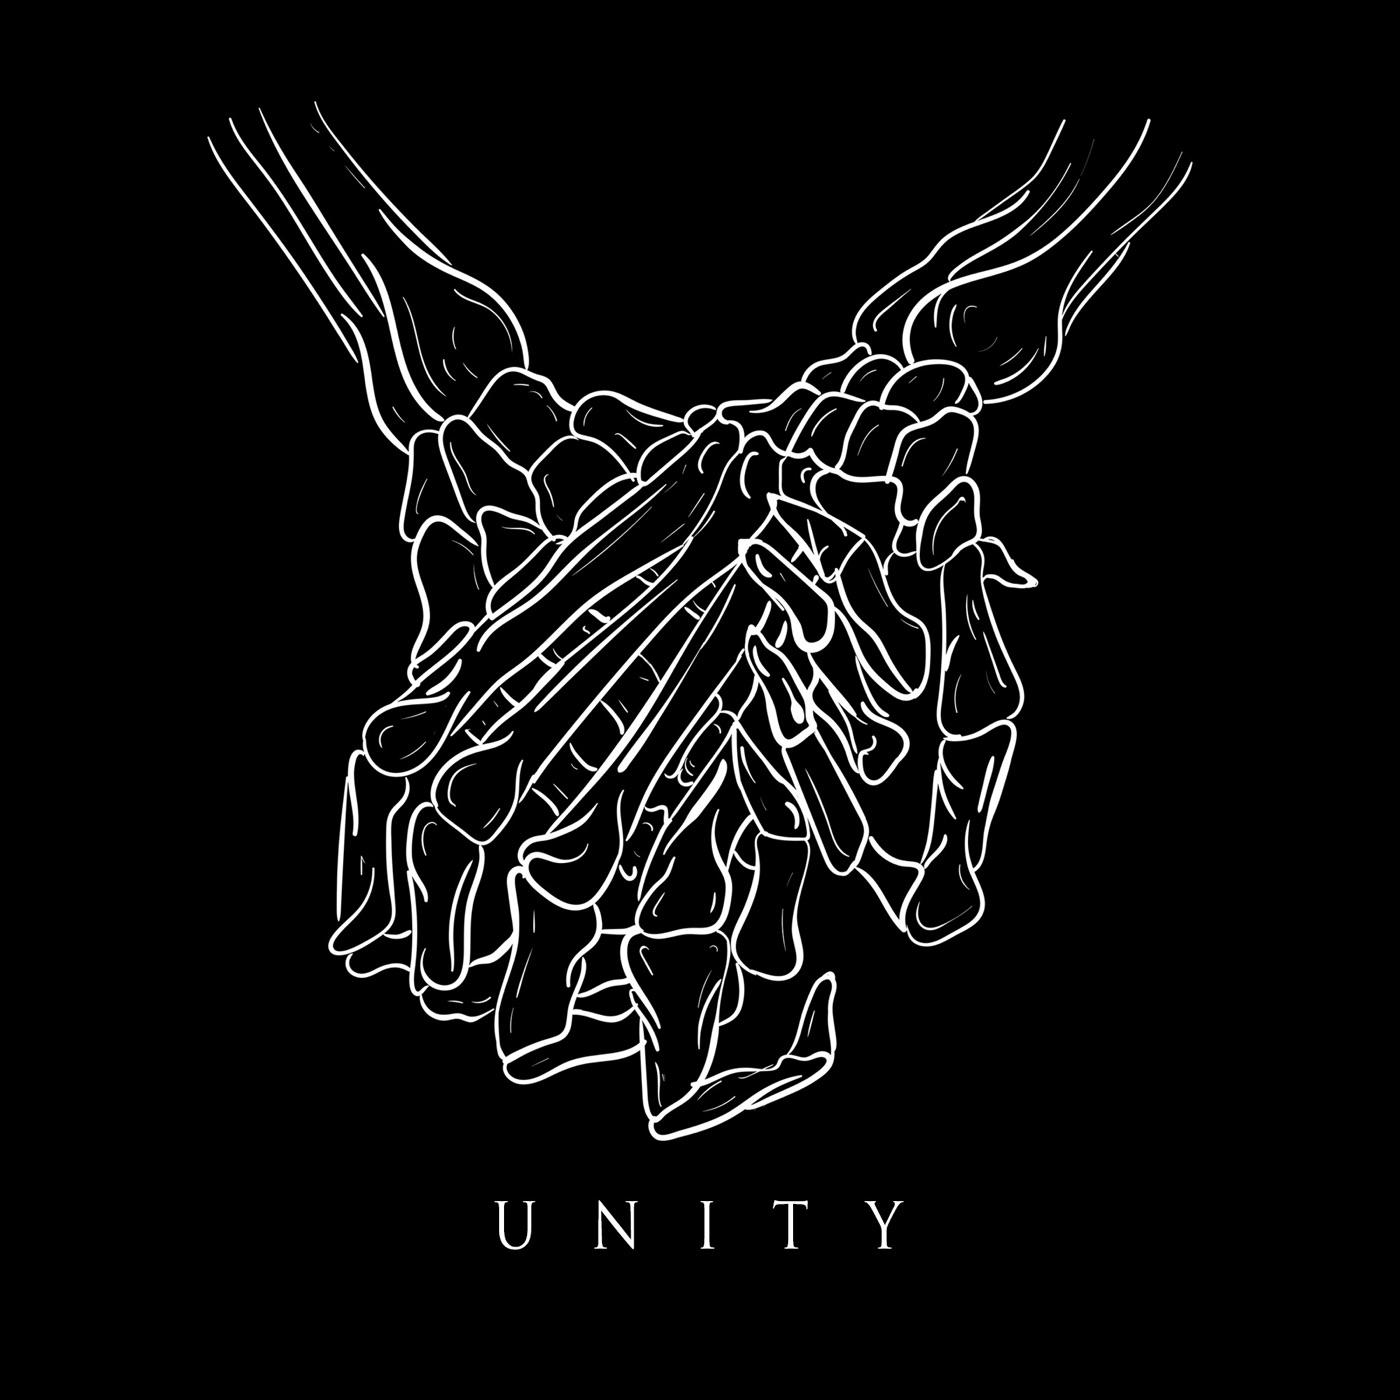 Varsity - Unity [single] (2017)